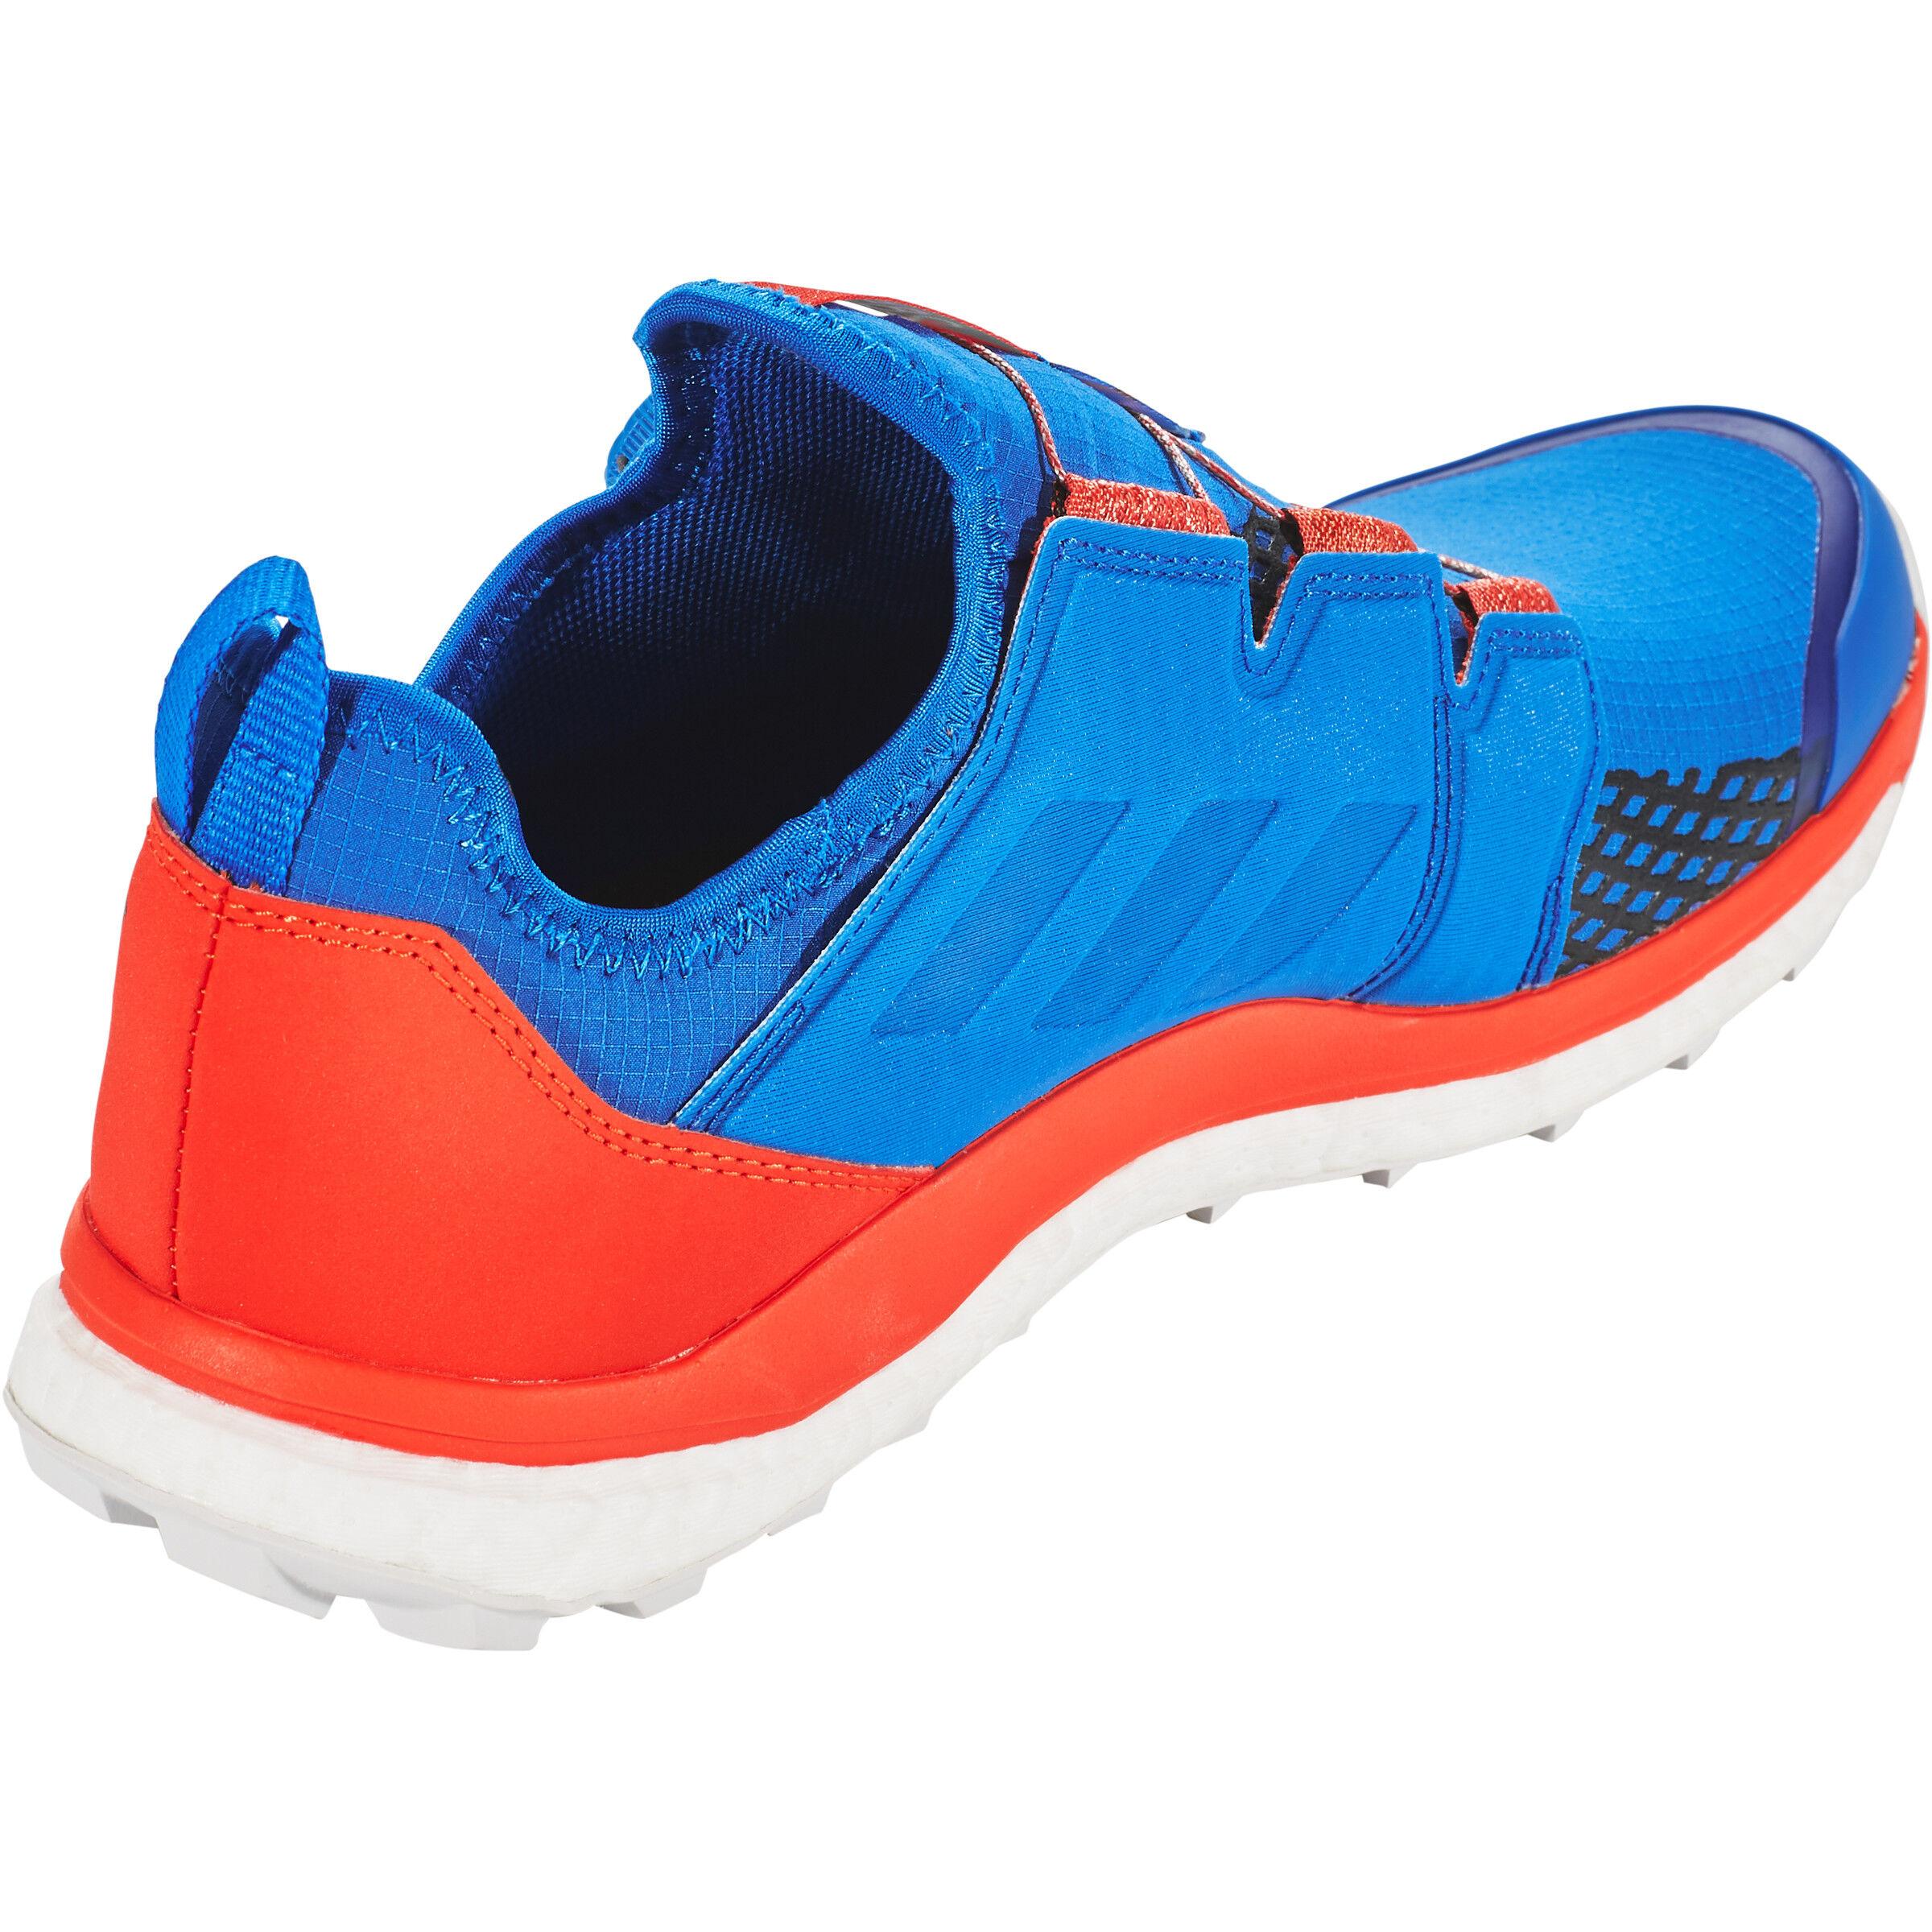 Adidas Five Ten | TERREX AGRAVIC BOA MEN'S TRAIL RUNNING SHOE